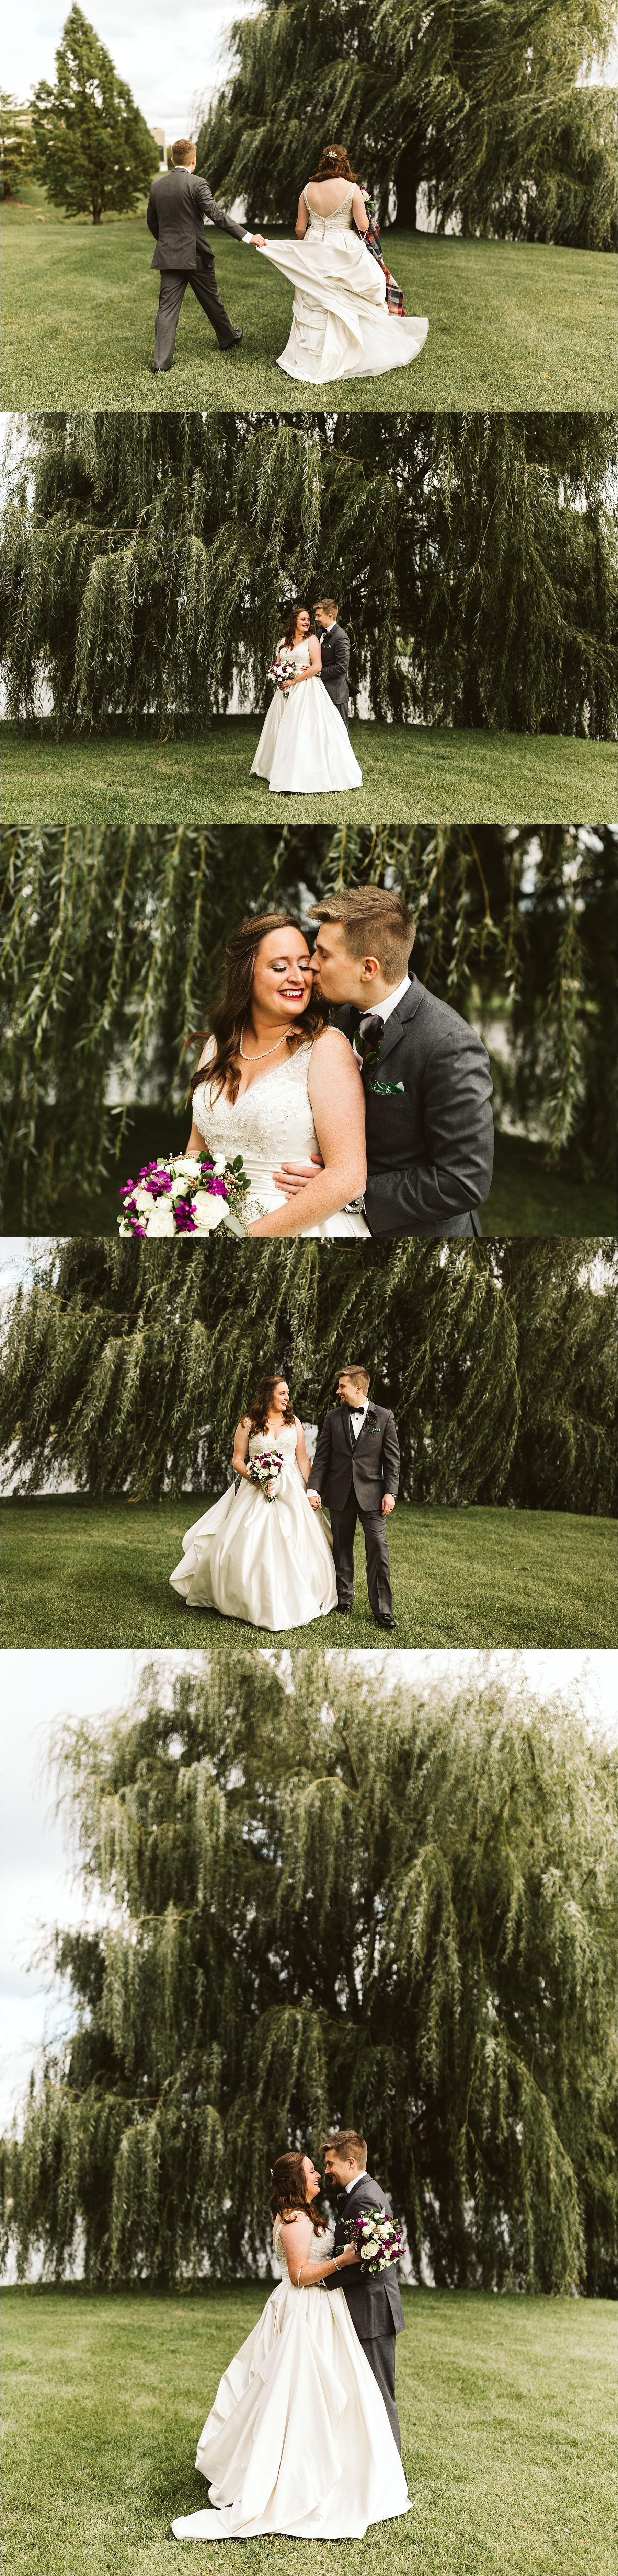 Burr Ridge Marriott Wedding_0076.jpg